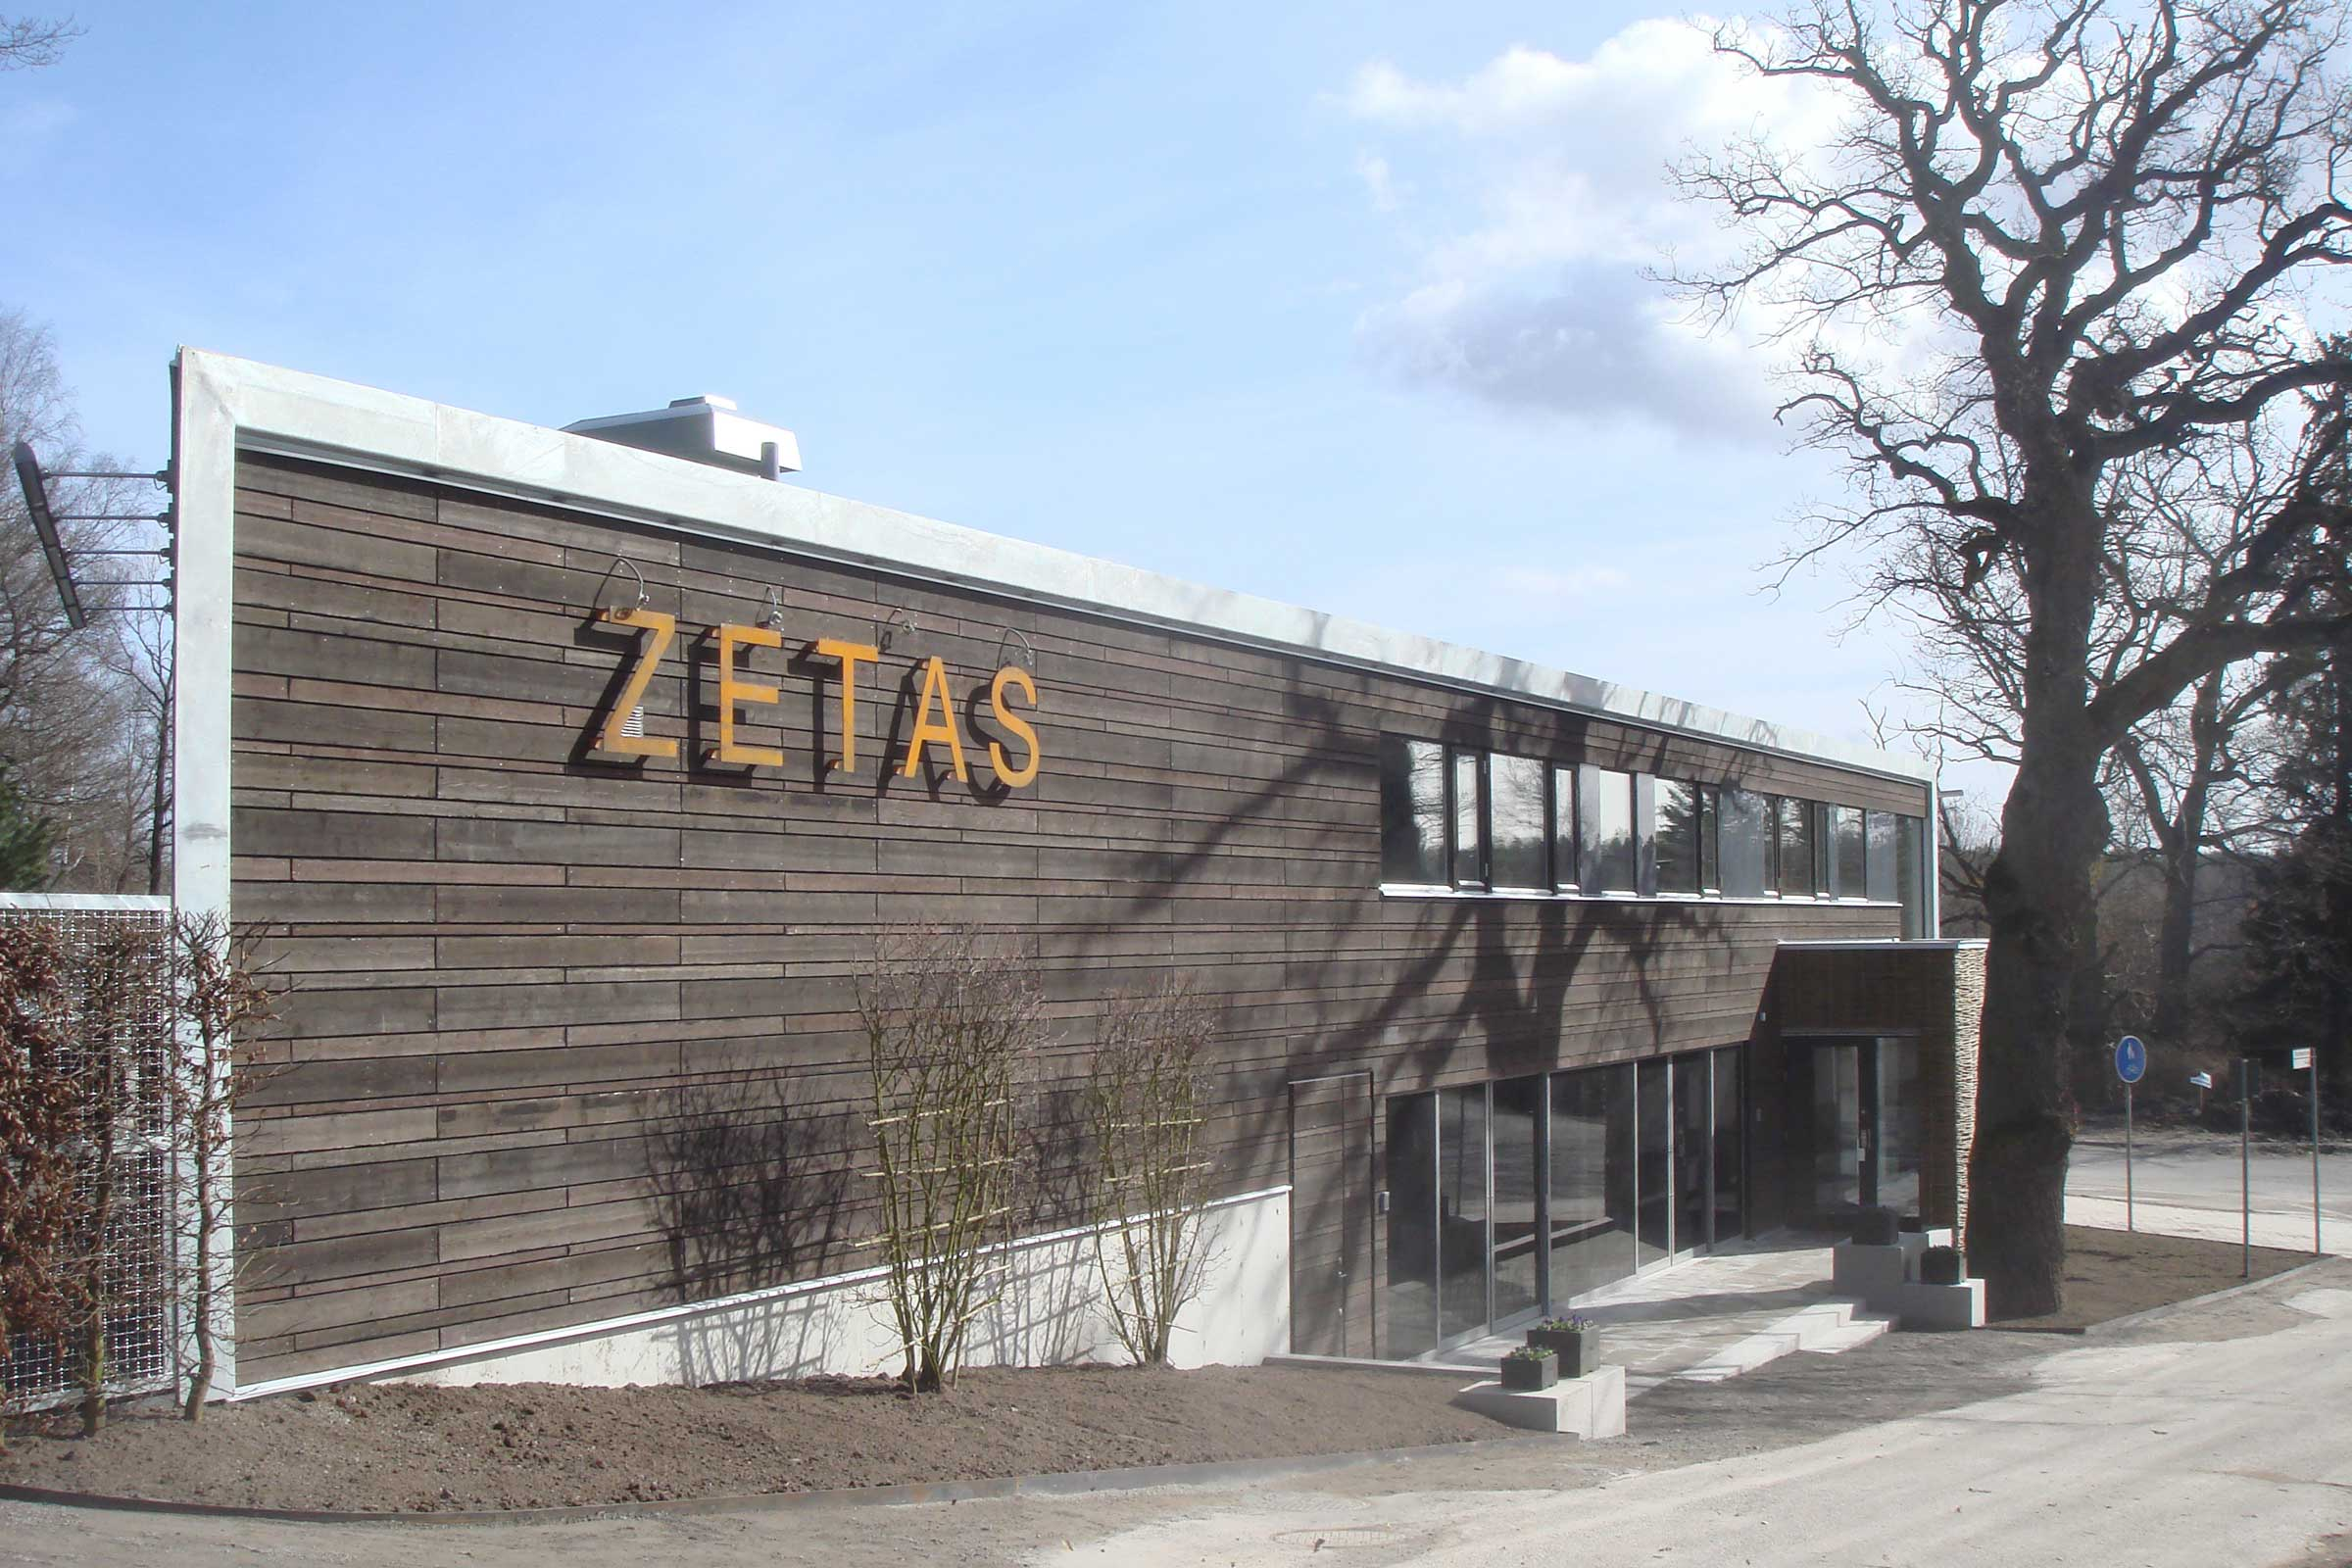 Zetas.